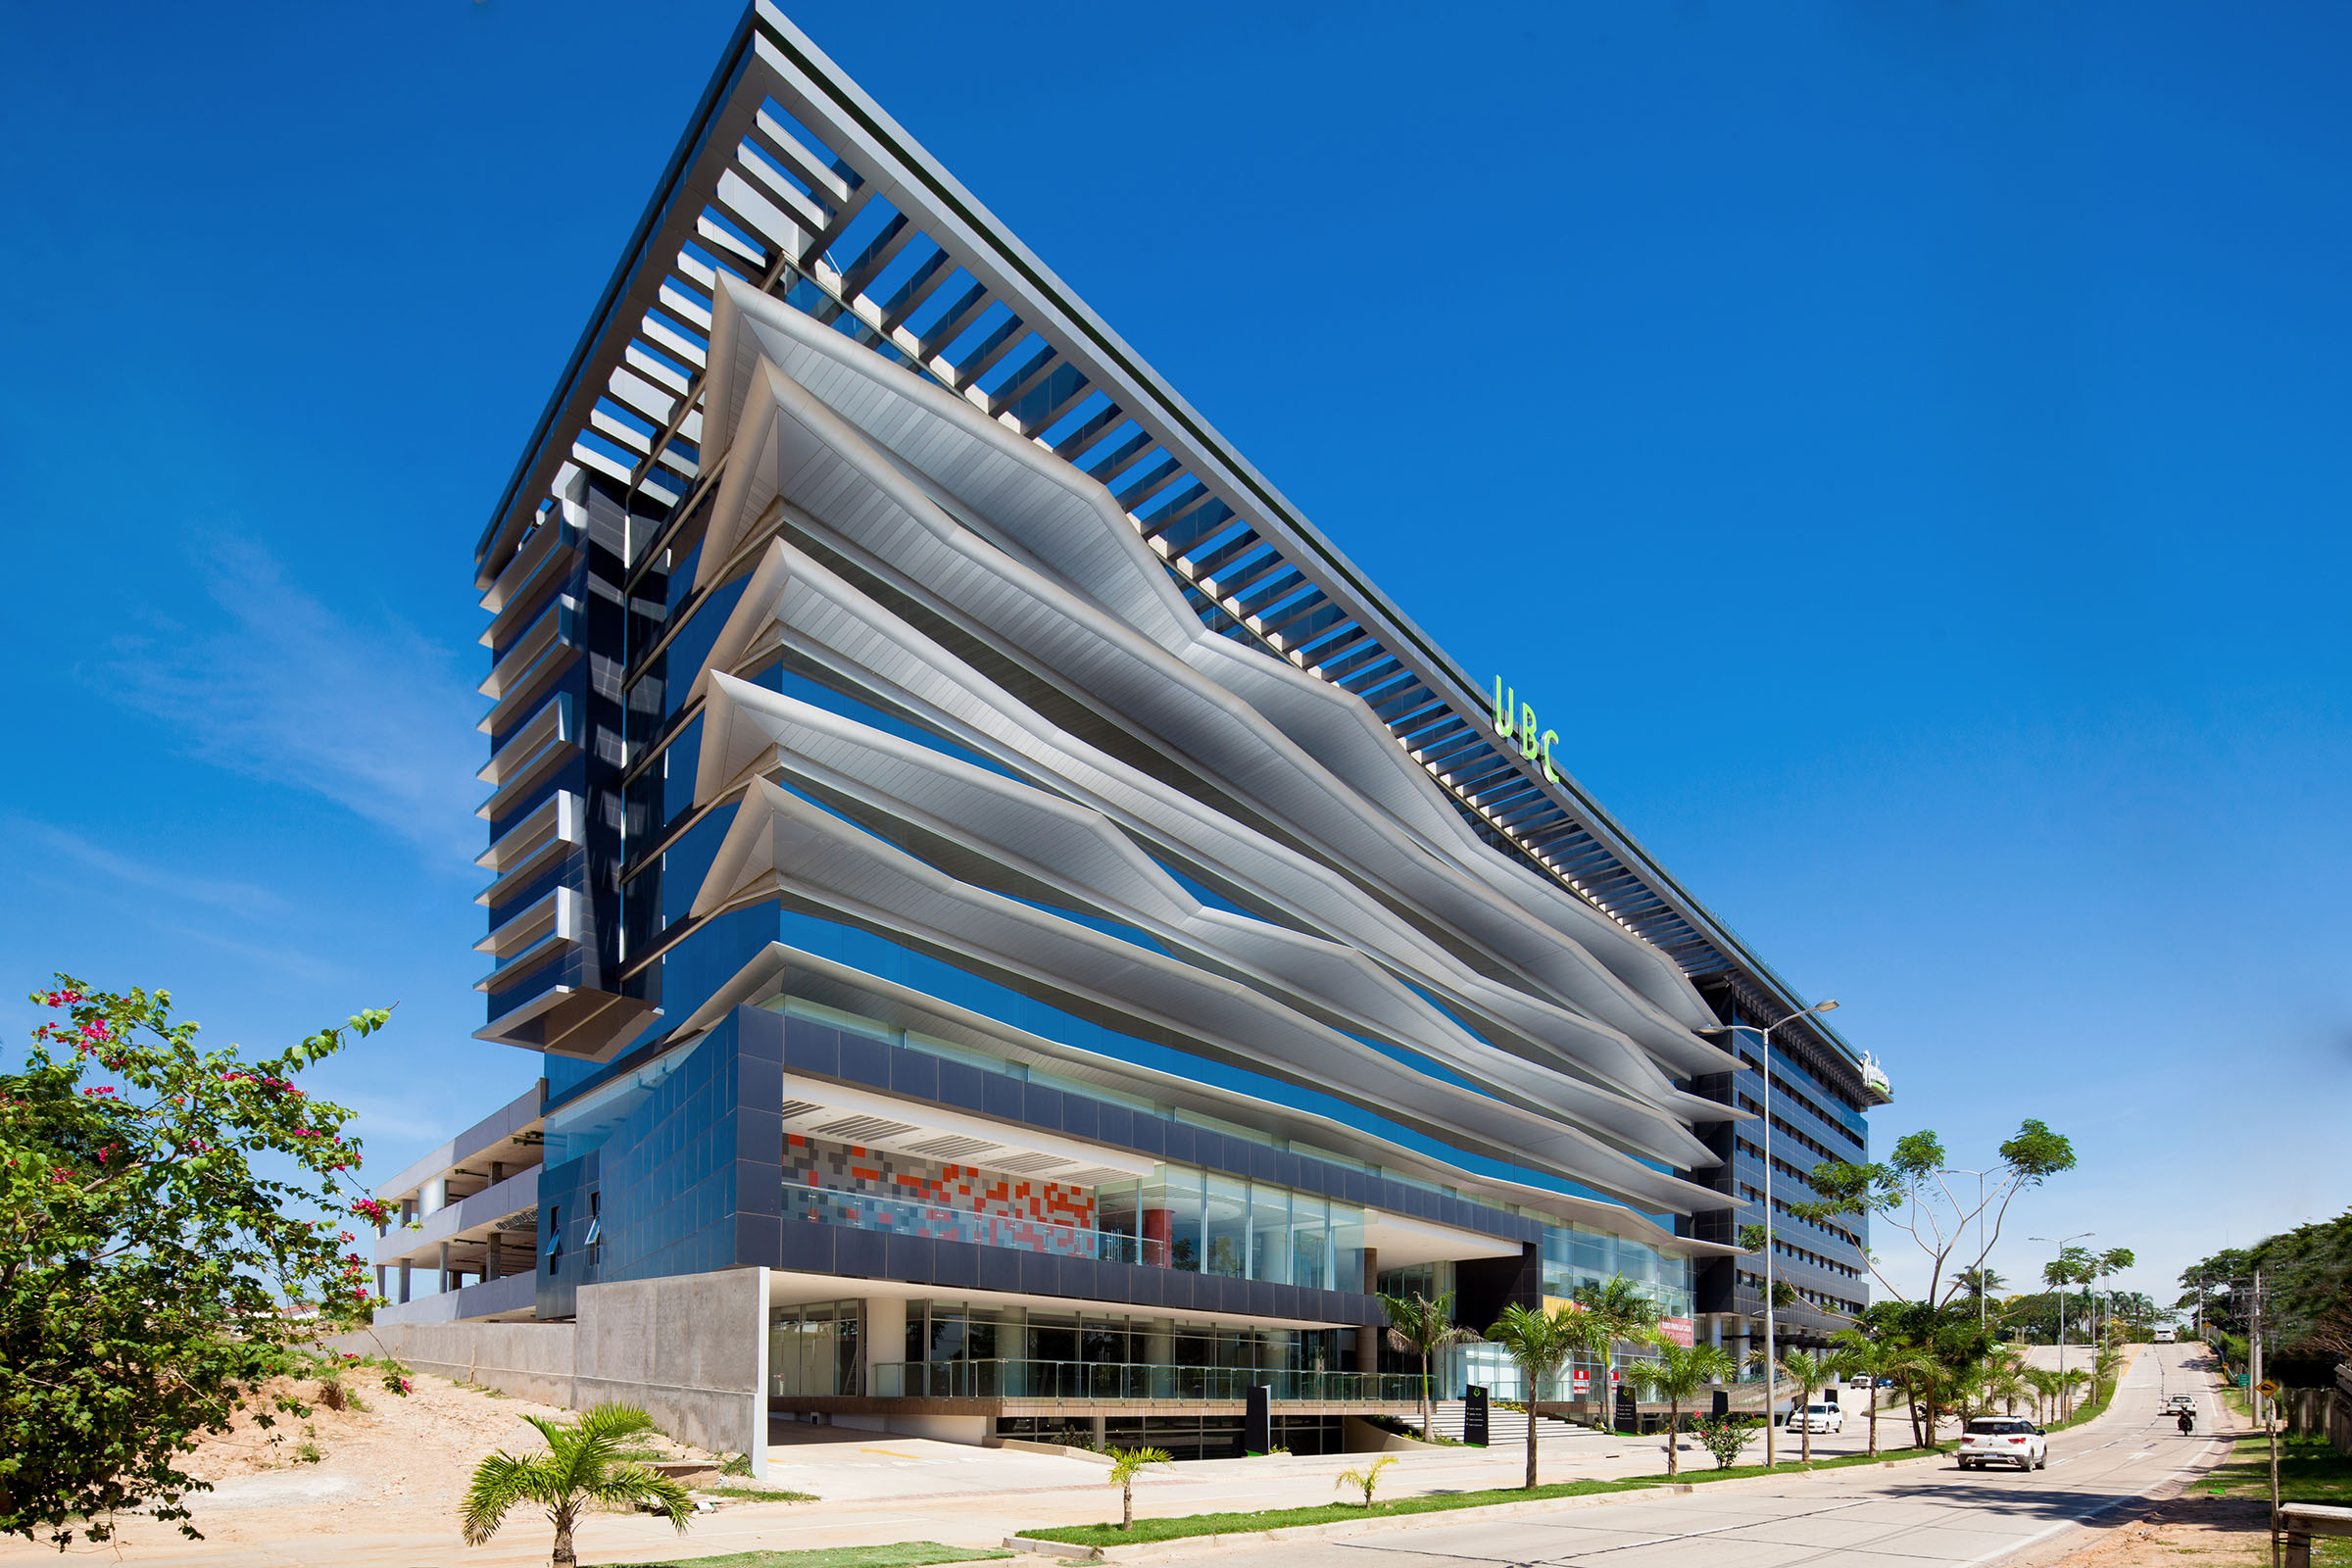 Sistemas fijos para protección solar pasiva con panel composite de aluminio STACBOND